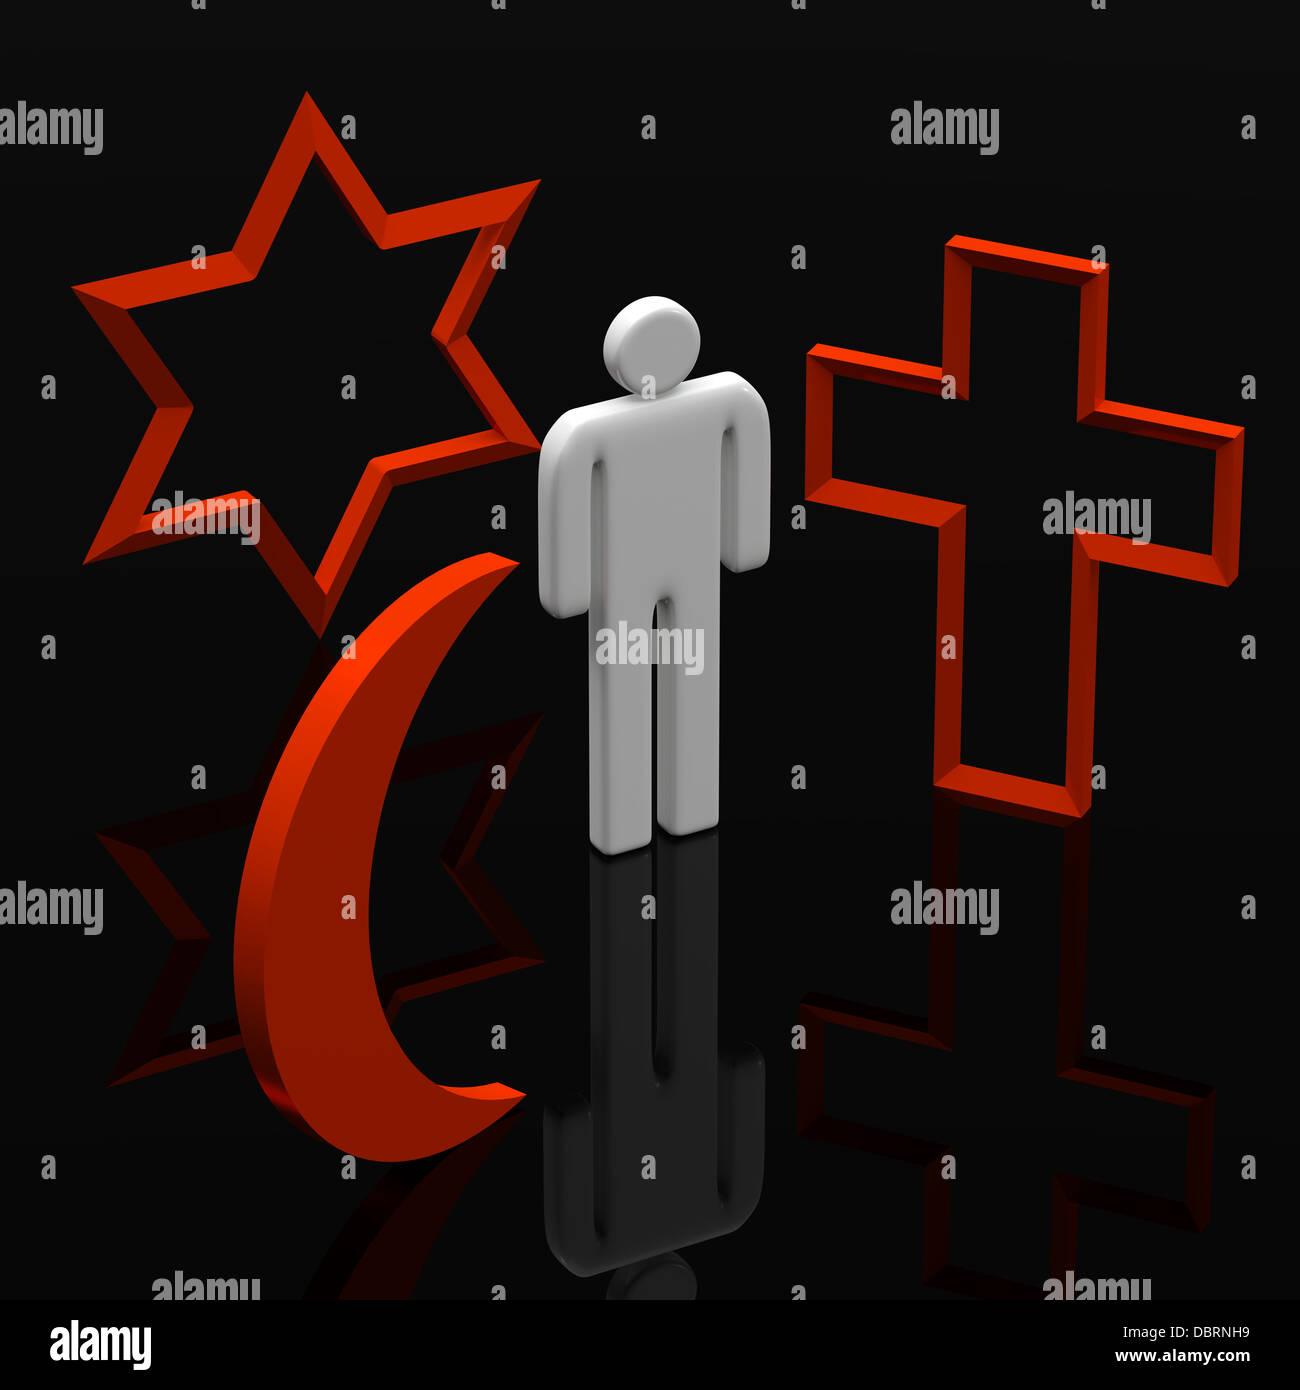 Three Dimensional Shape The Main Religious Symbols Stock Photo